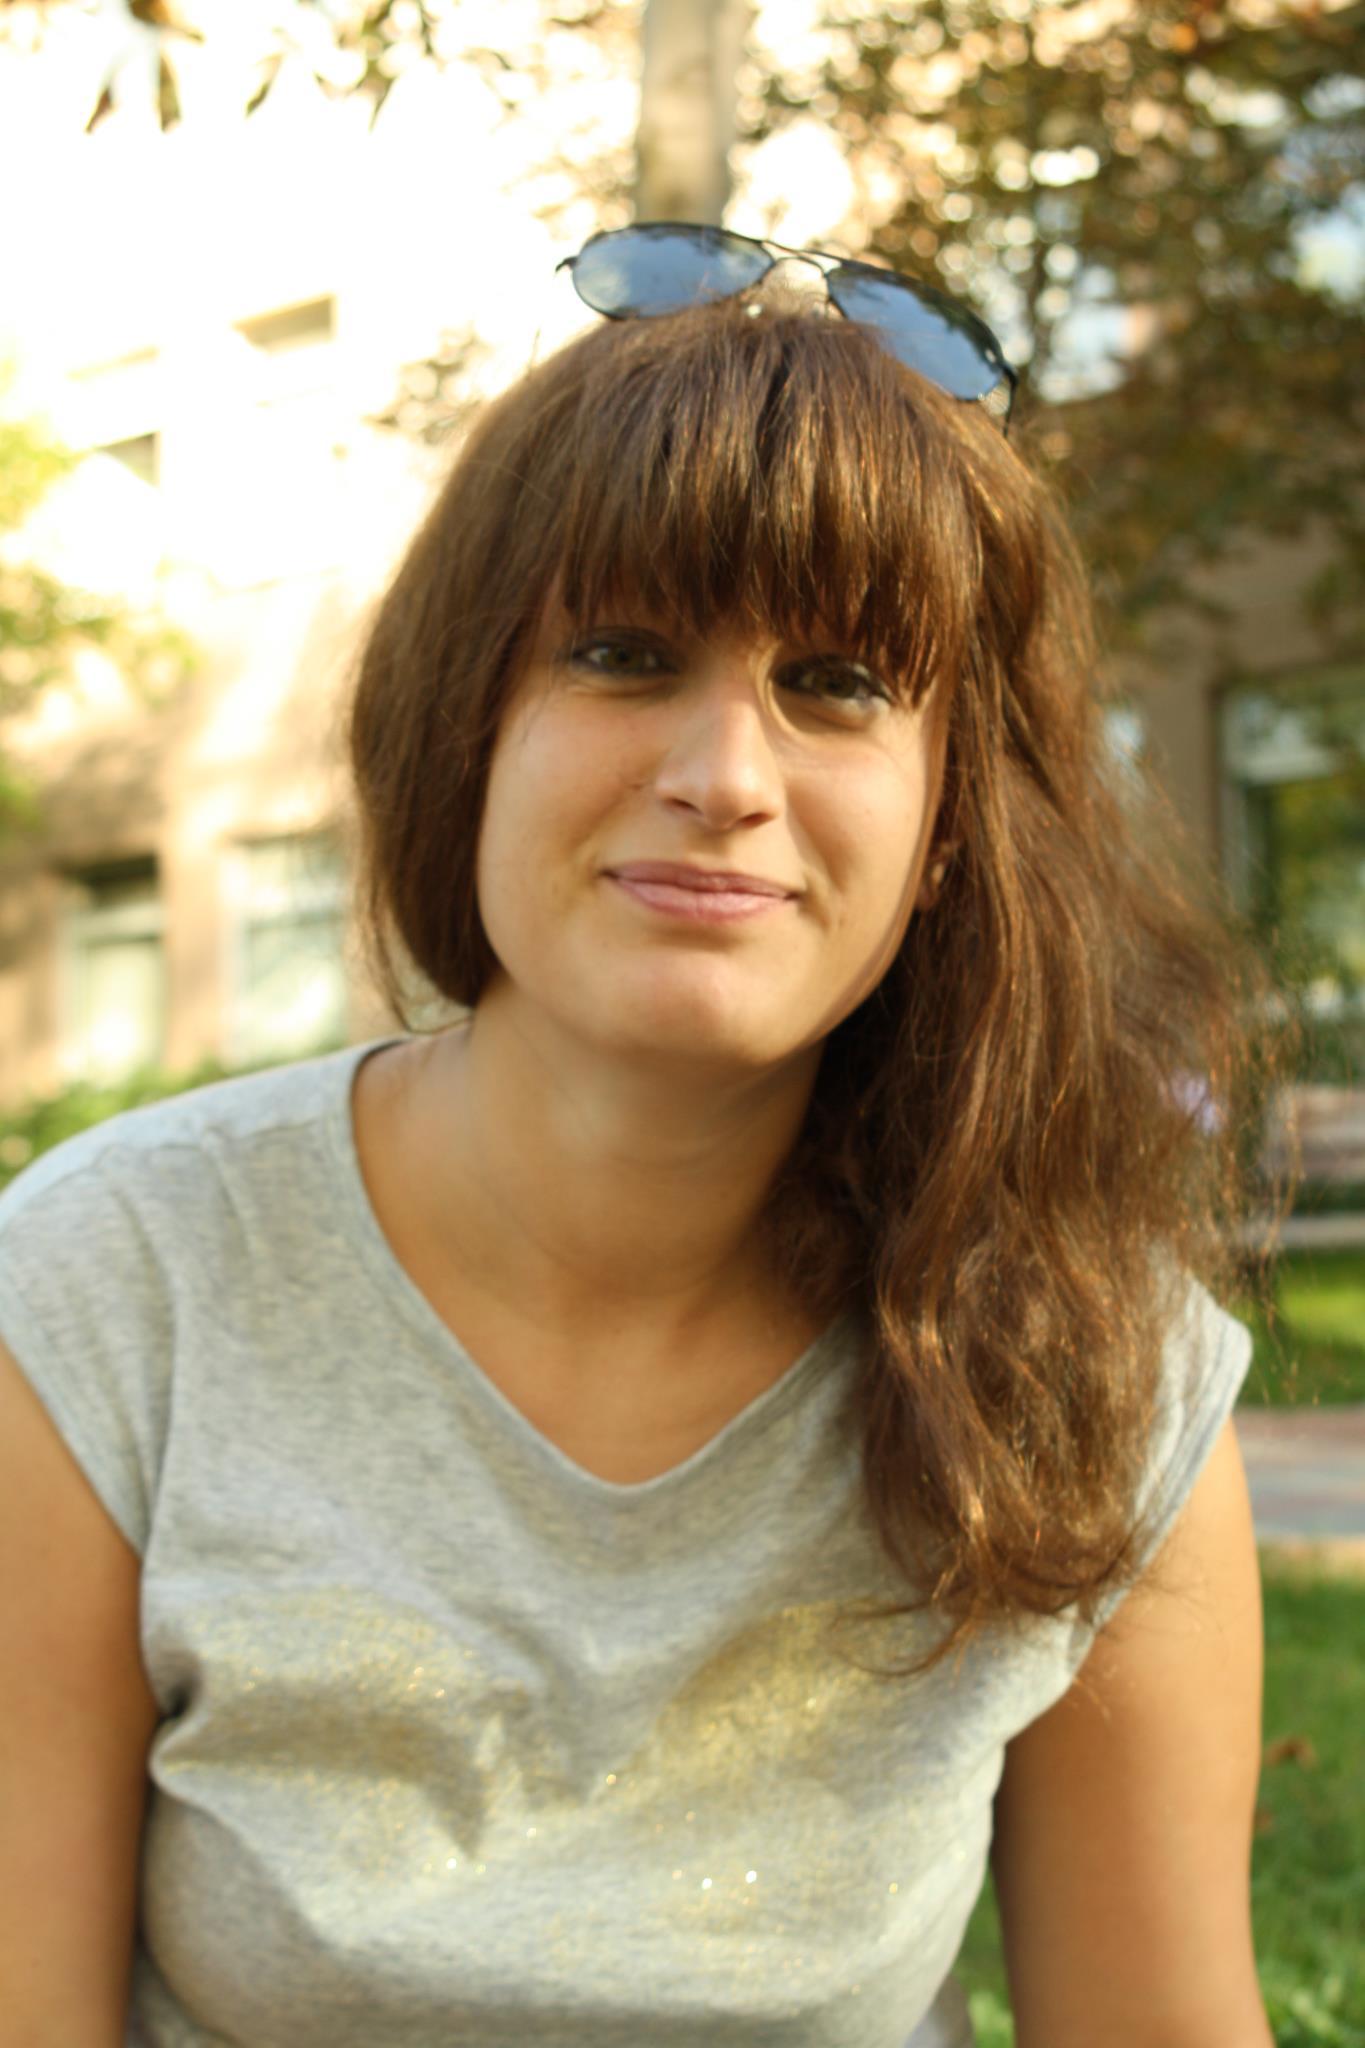 Natali Saginashvili